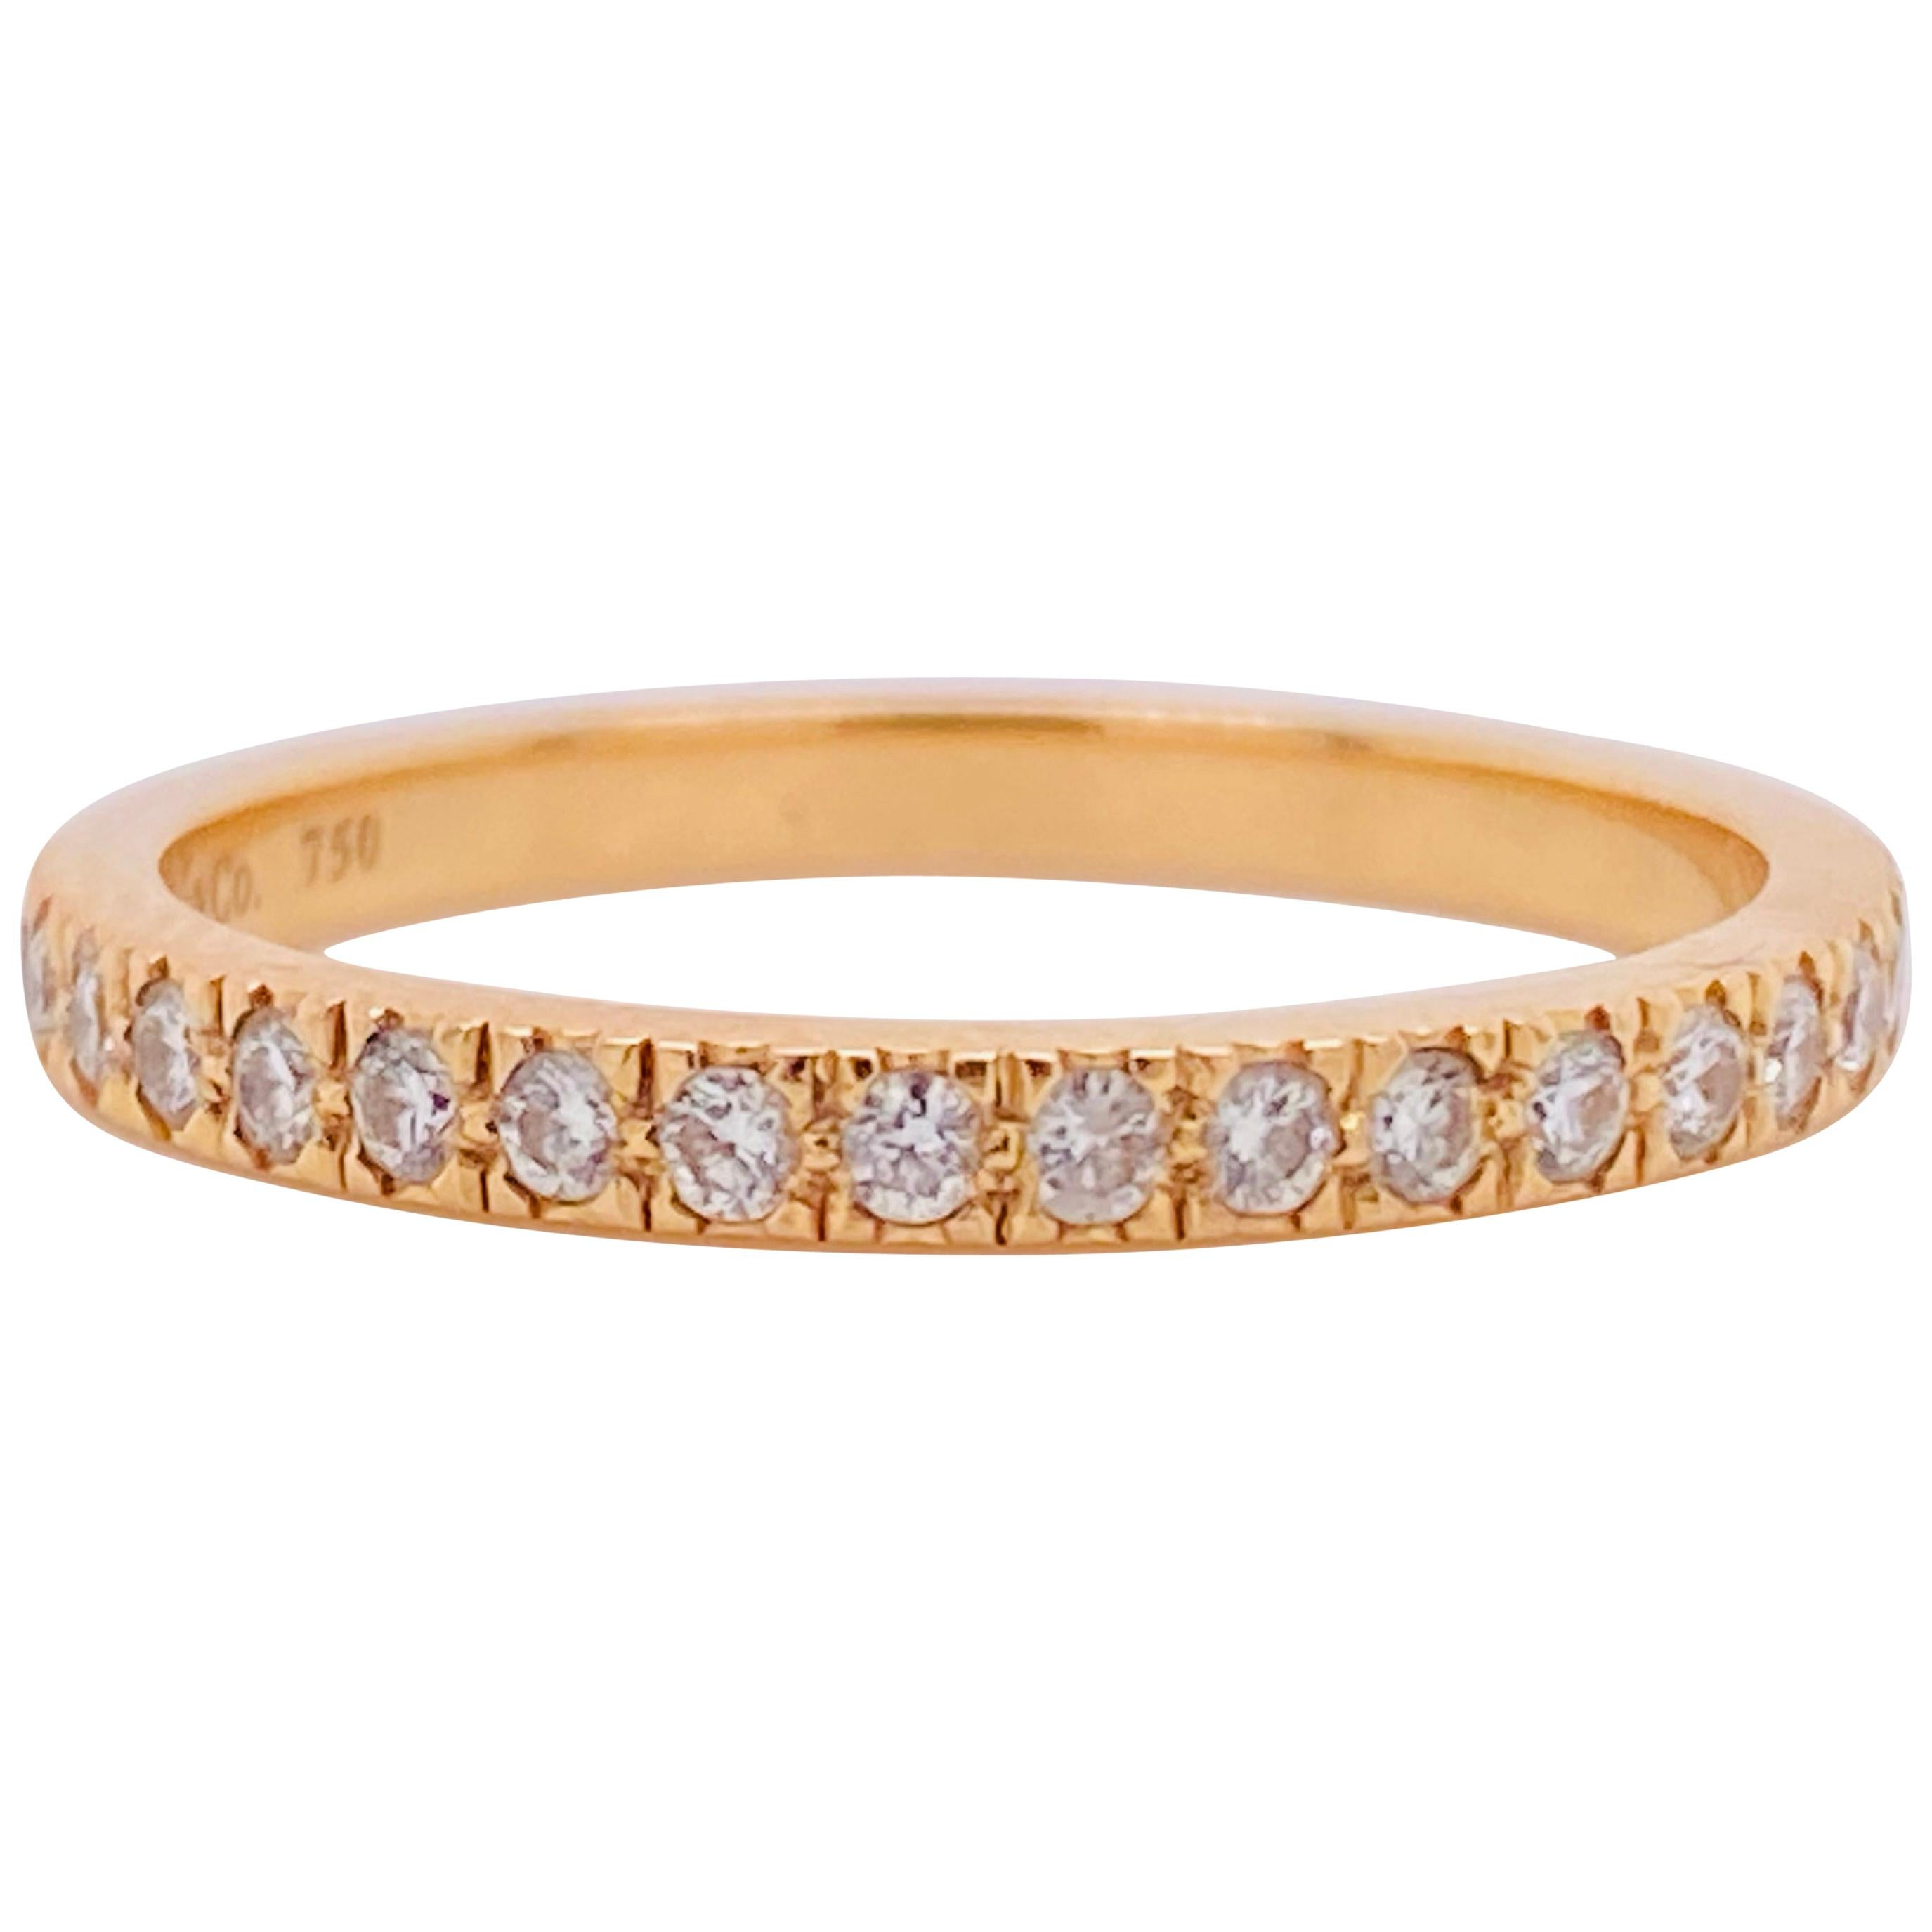 Tiffany & Co. Diamond 18 Karat Gold Band, Rose Gold Tiffany & Co. Ring .30 Carat